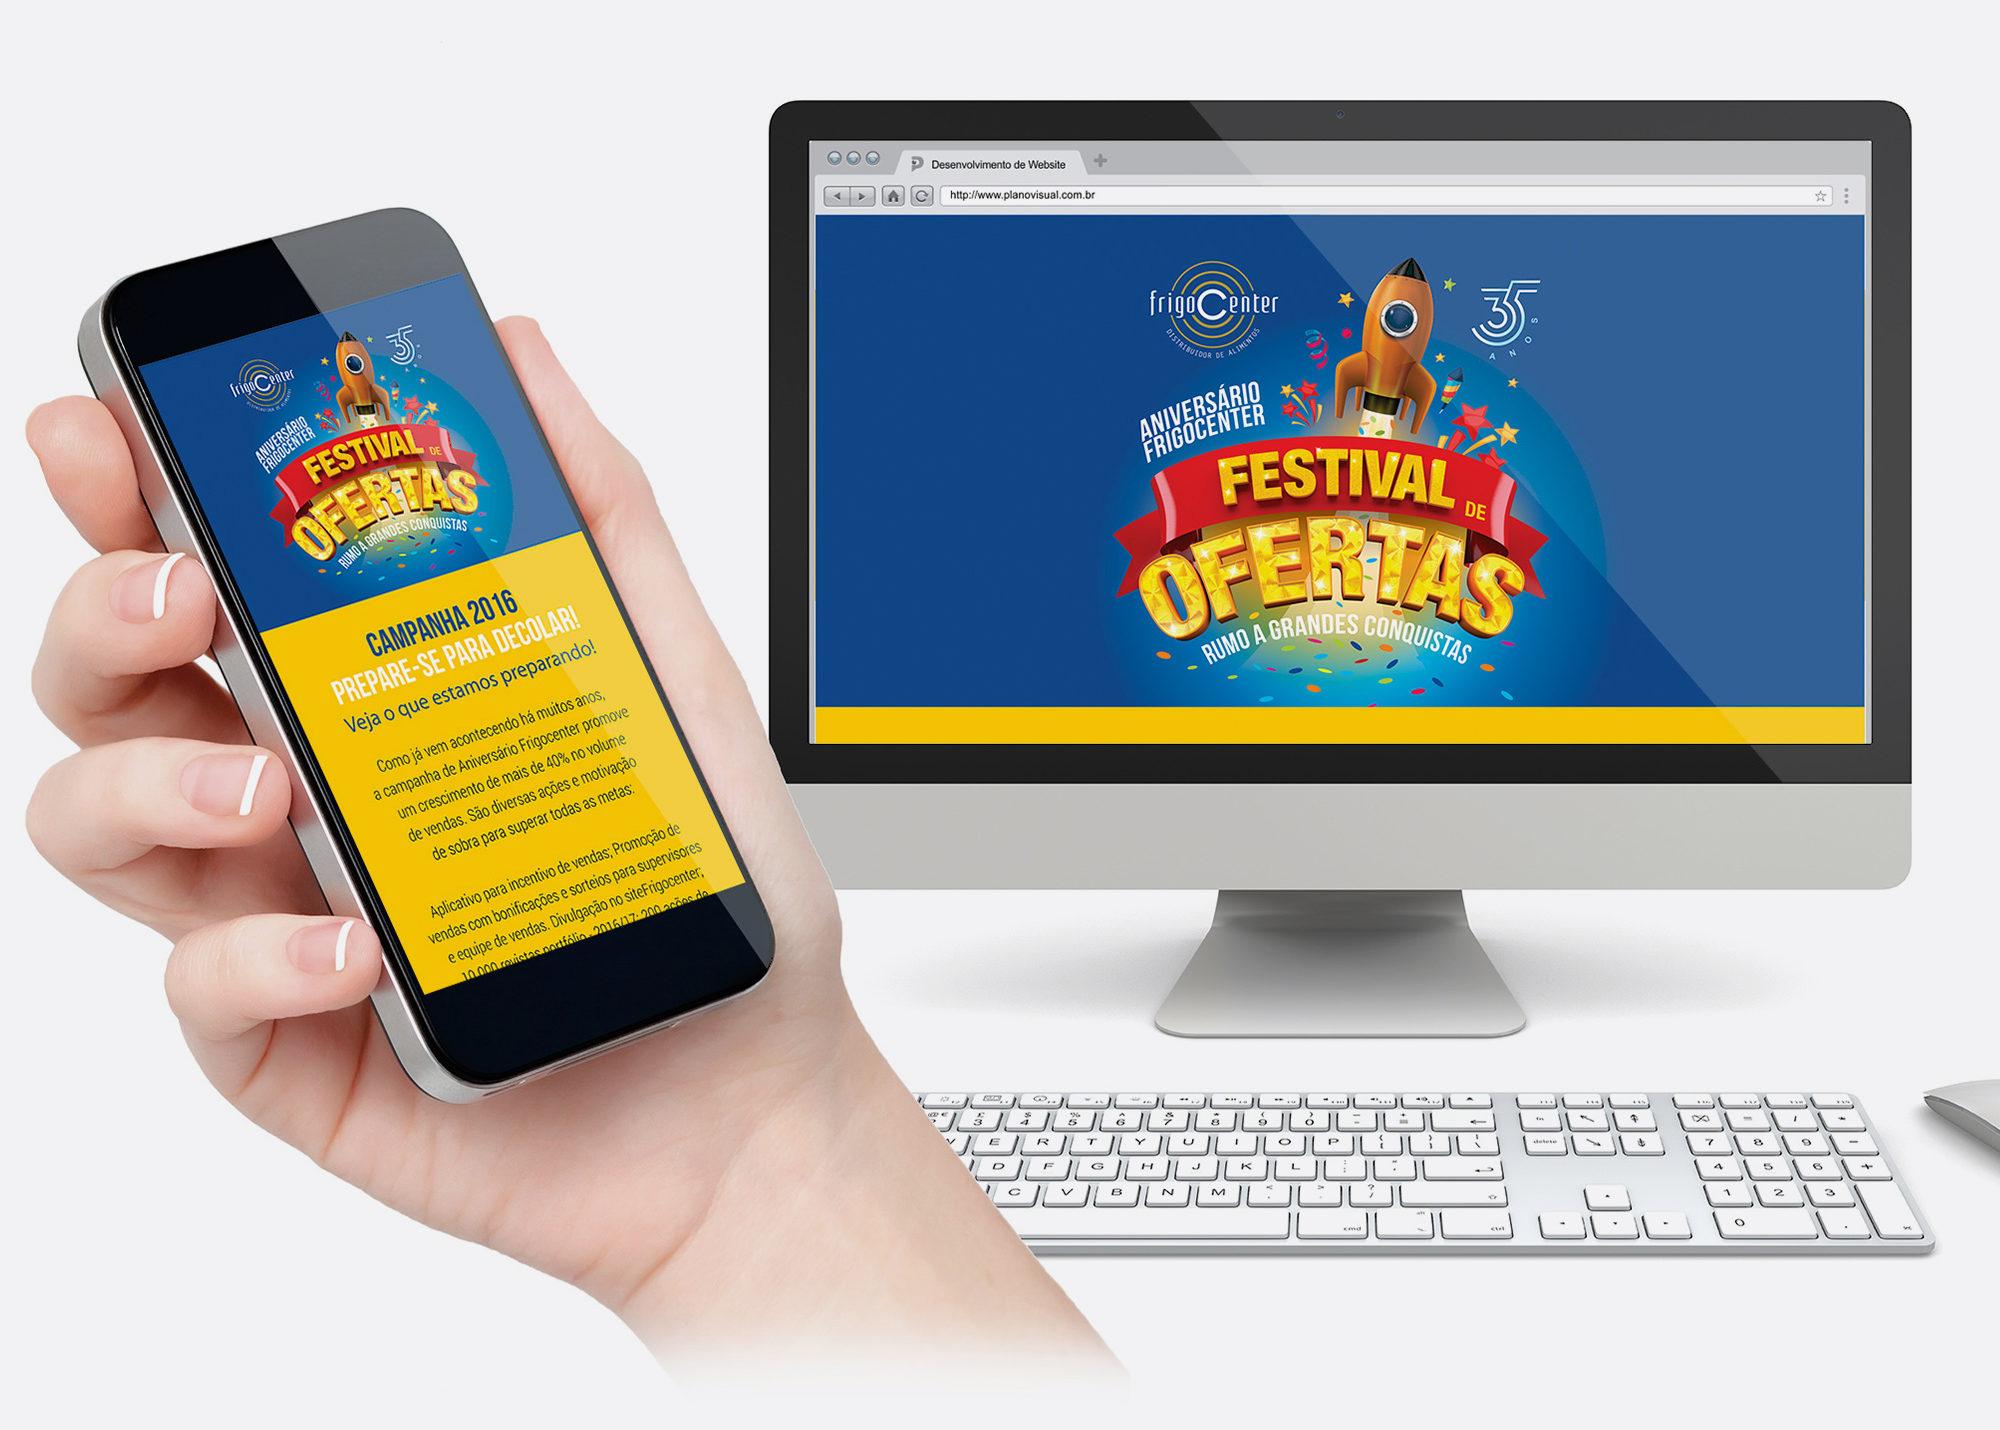 frigocenter-distribuidor-alimentos-campanha-aniversario-35-anos-apresentacao-landing-page